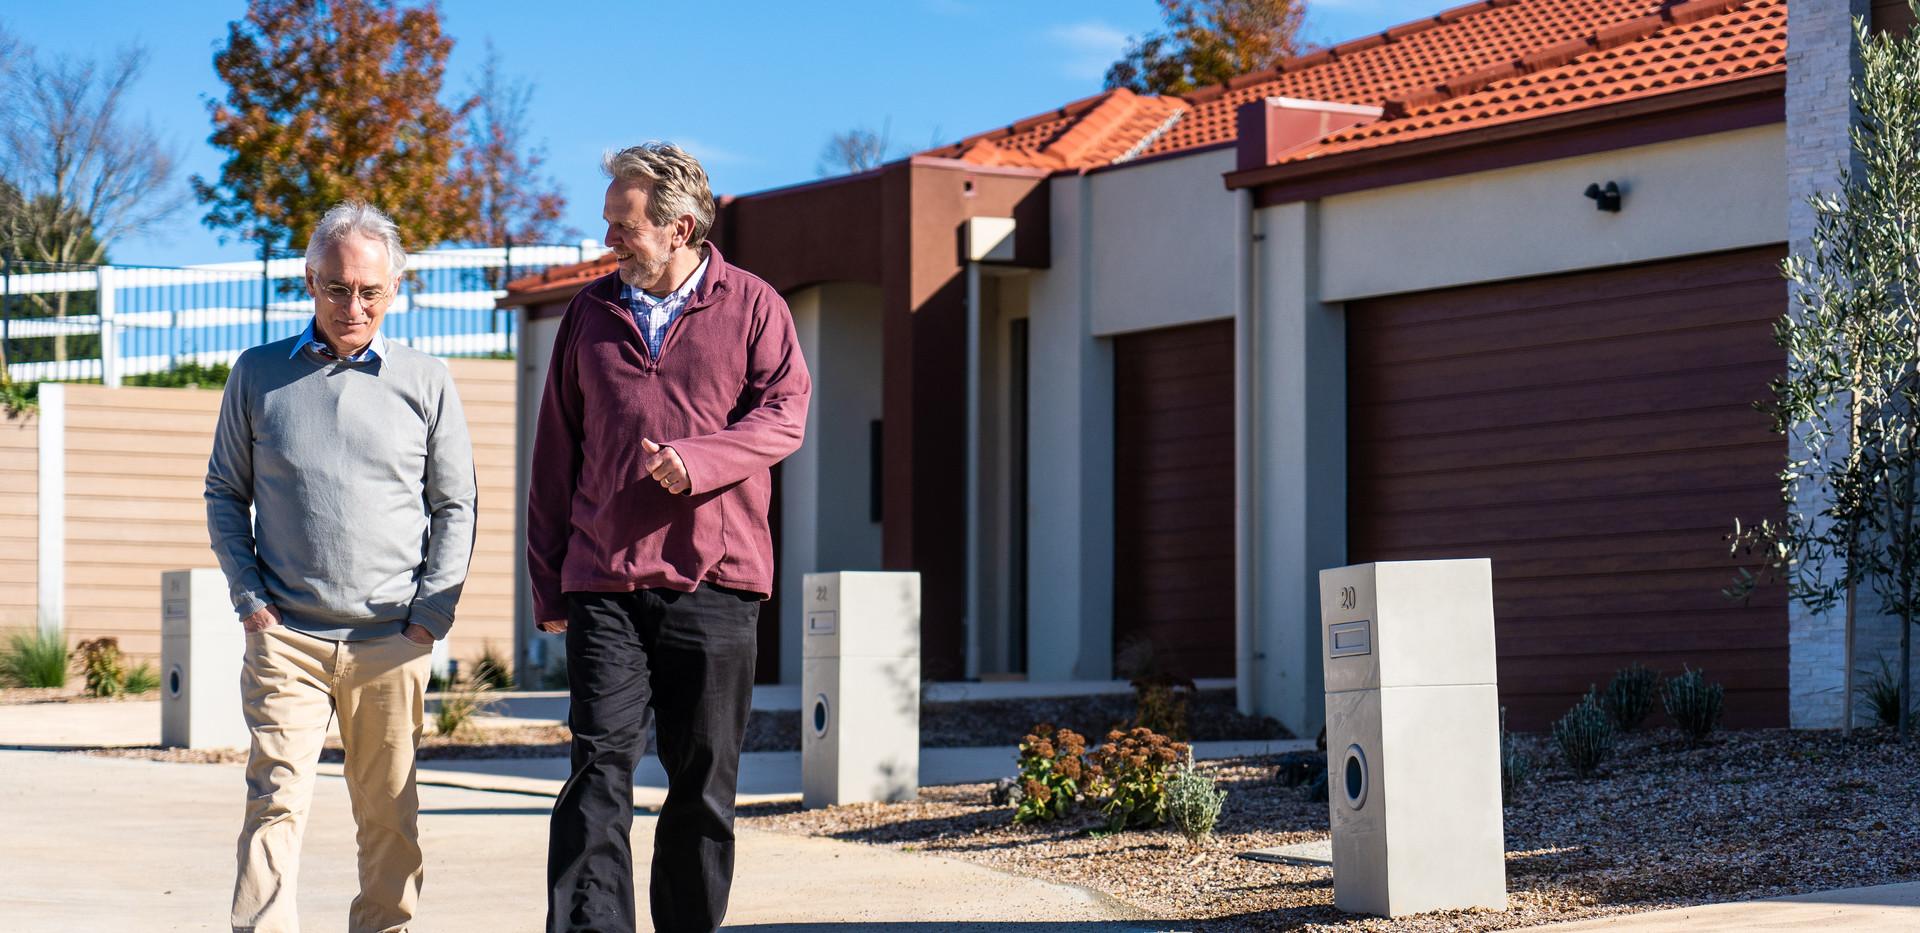 residents walking past the luxury villas at La Dimora Retirement Village 1 Hour North of Melbourne